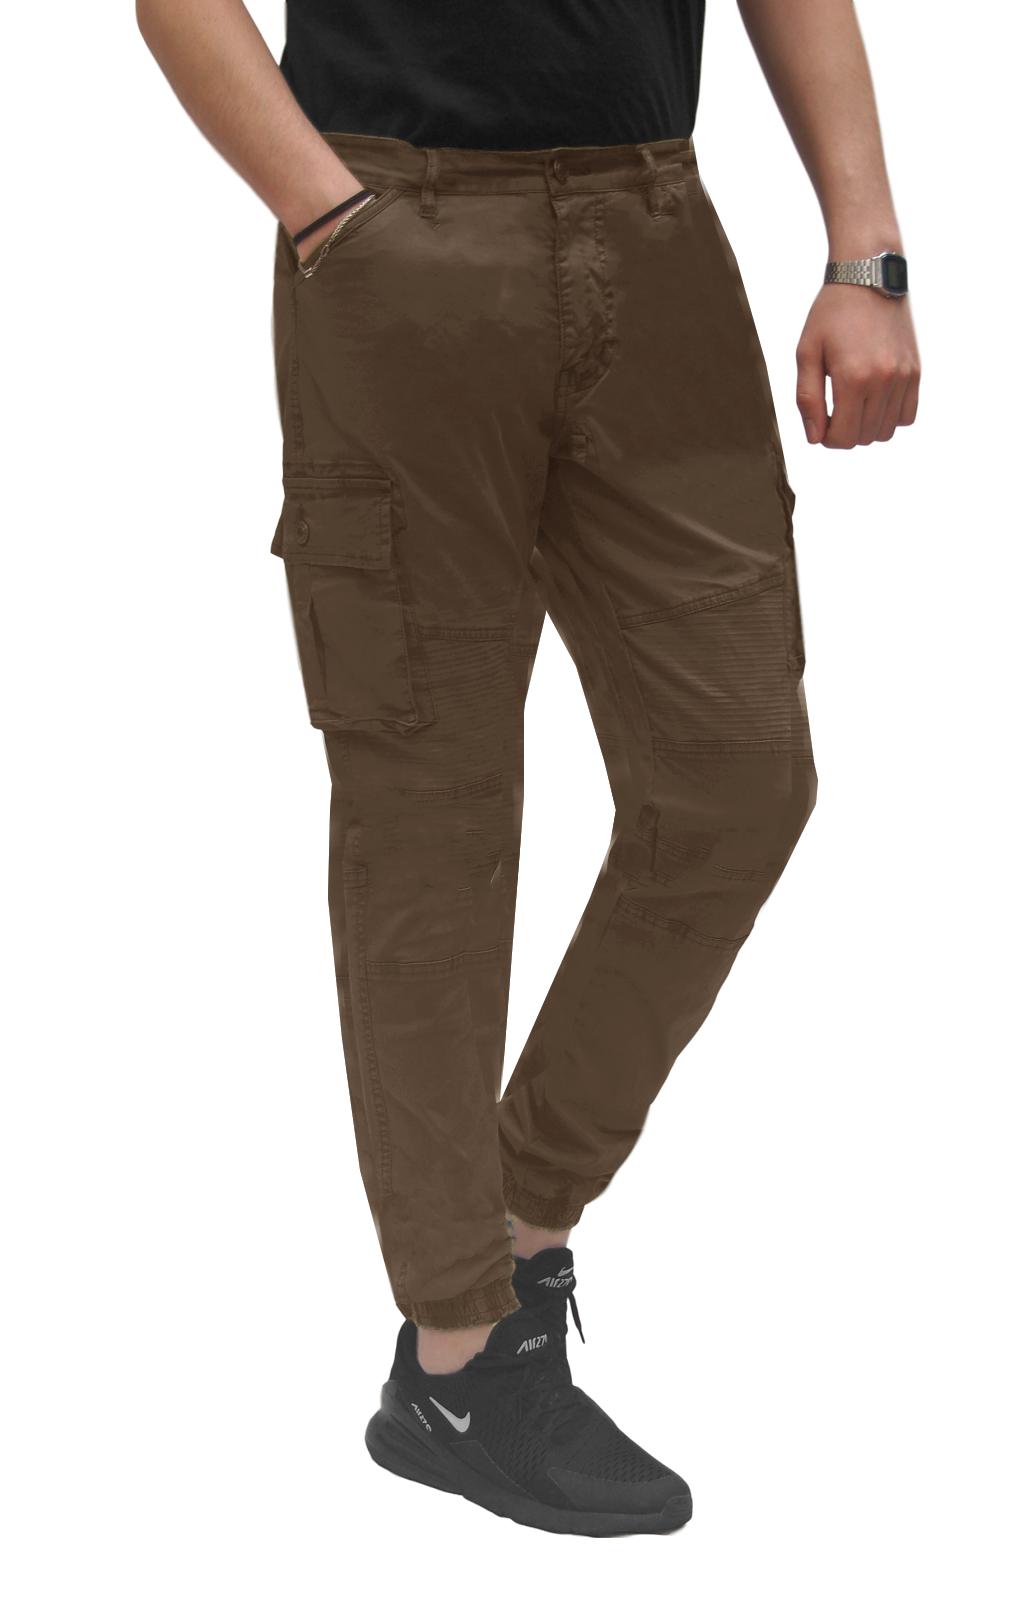 Pantalone-Uomo-Cargo-Con-Tasconi-Invernale-Verde-Blu-Nero-Marrone-Pantaloni-slim miniatura 27